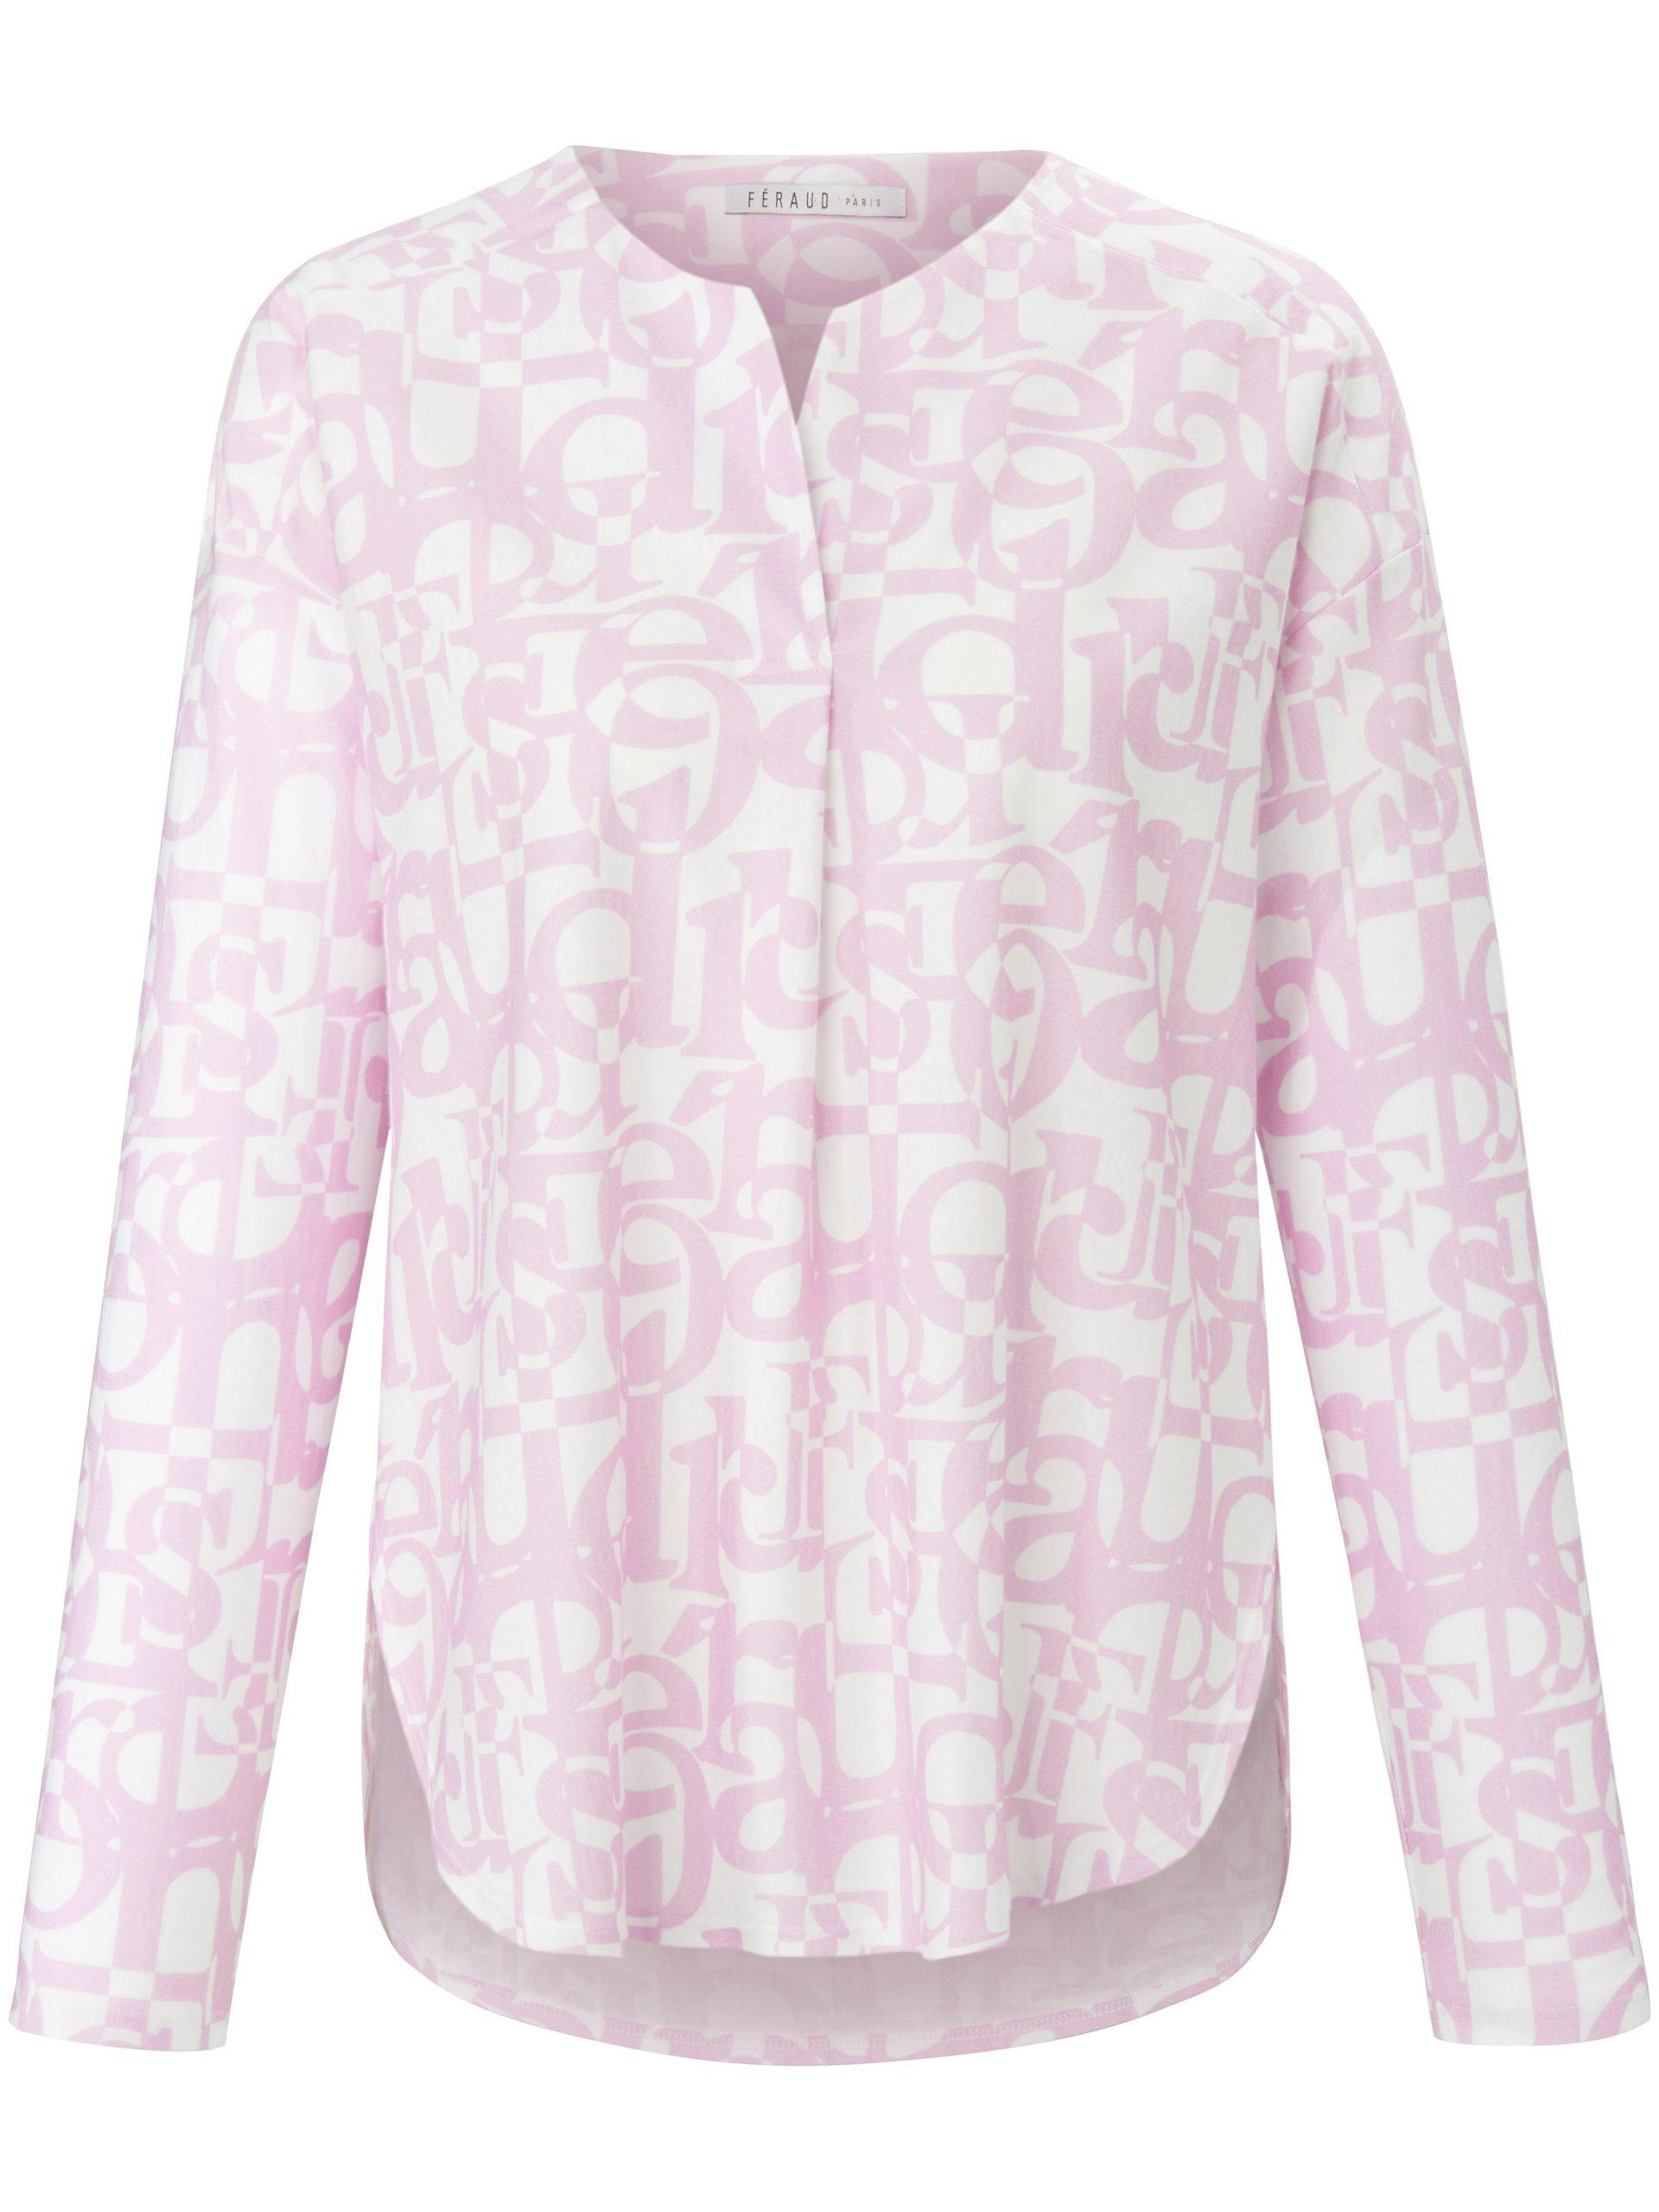 Pyjama van 100% katoen met letterprint Van Féraud paars Kopen